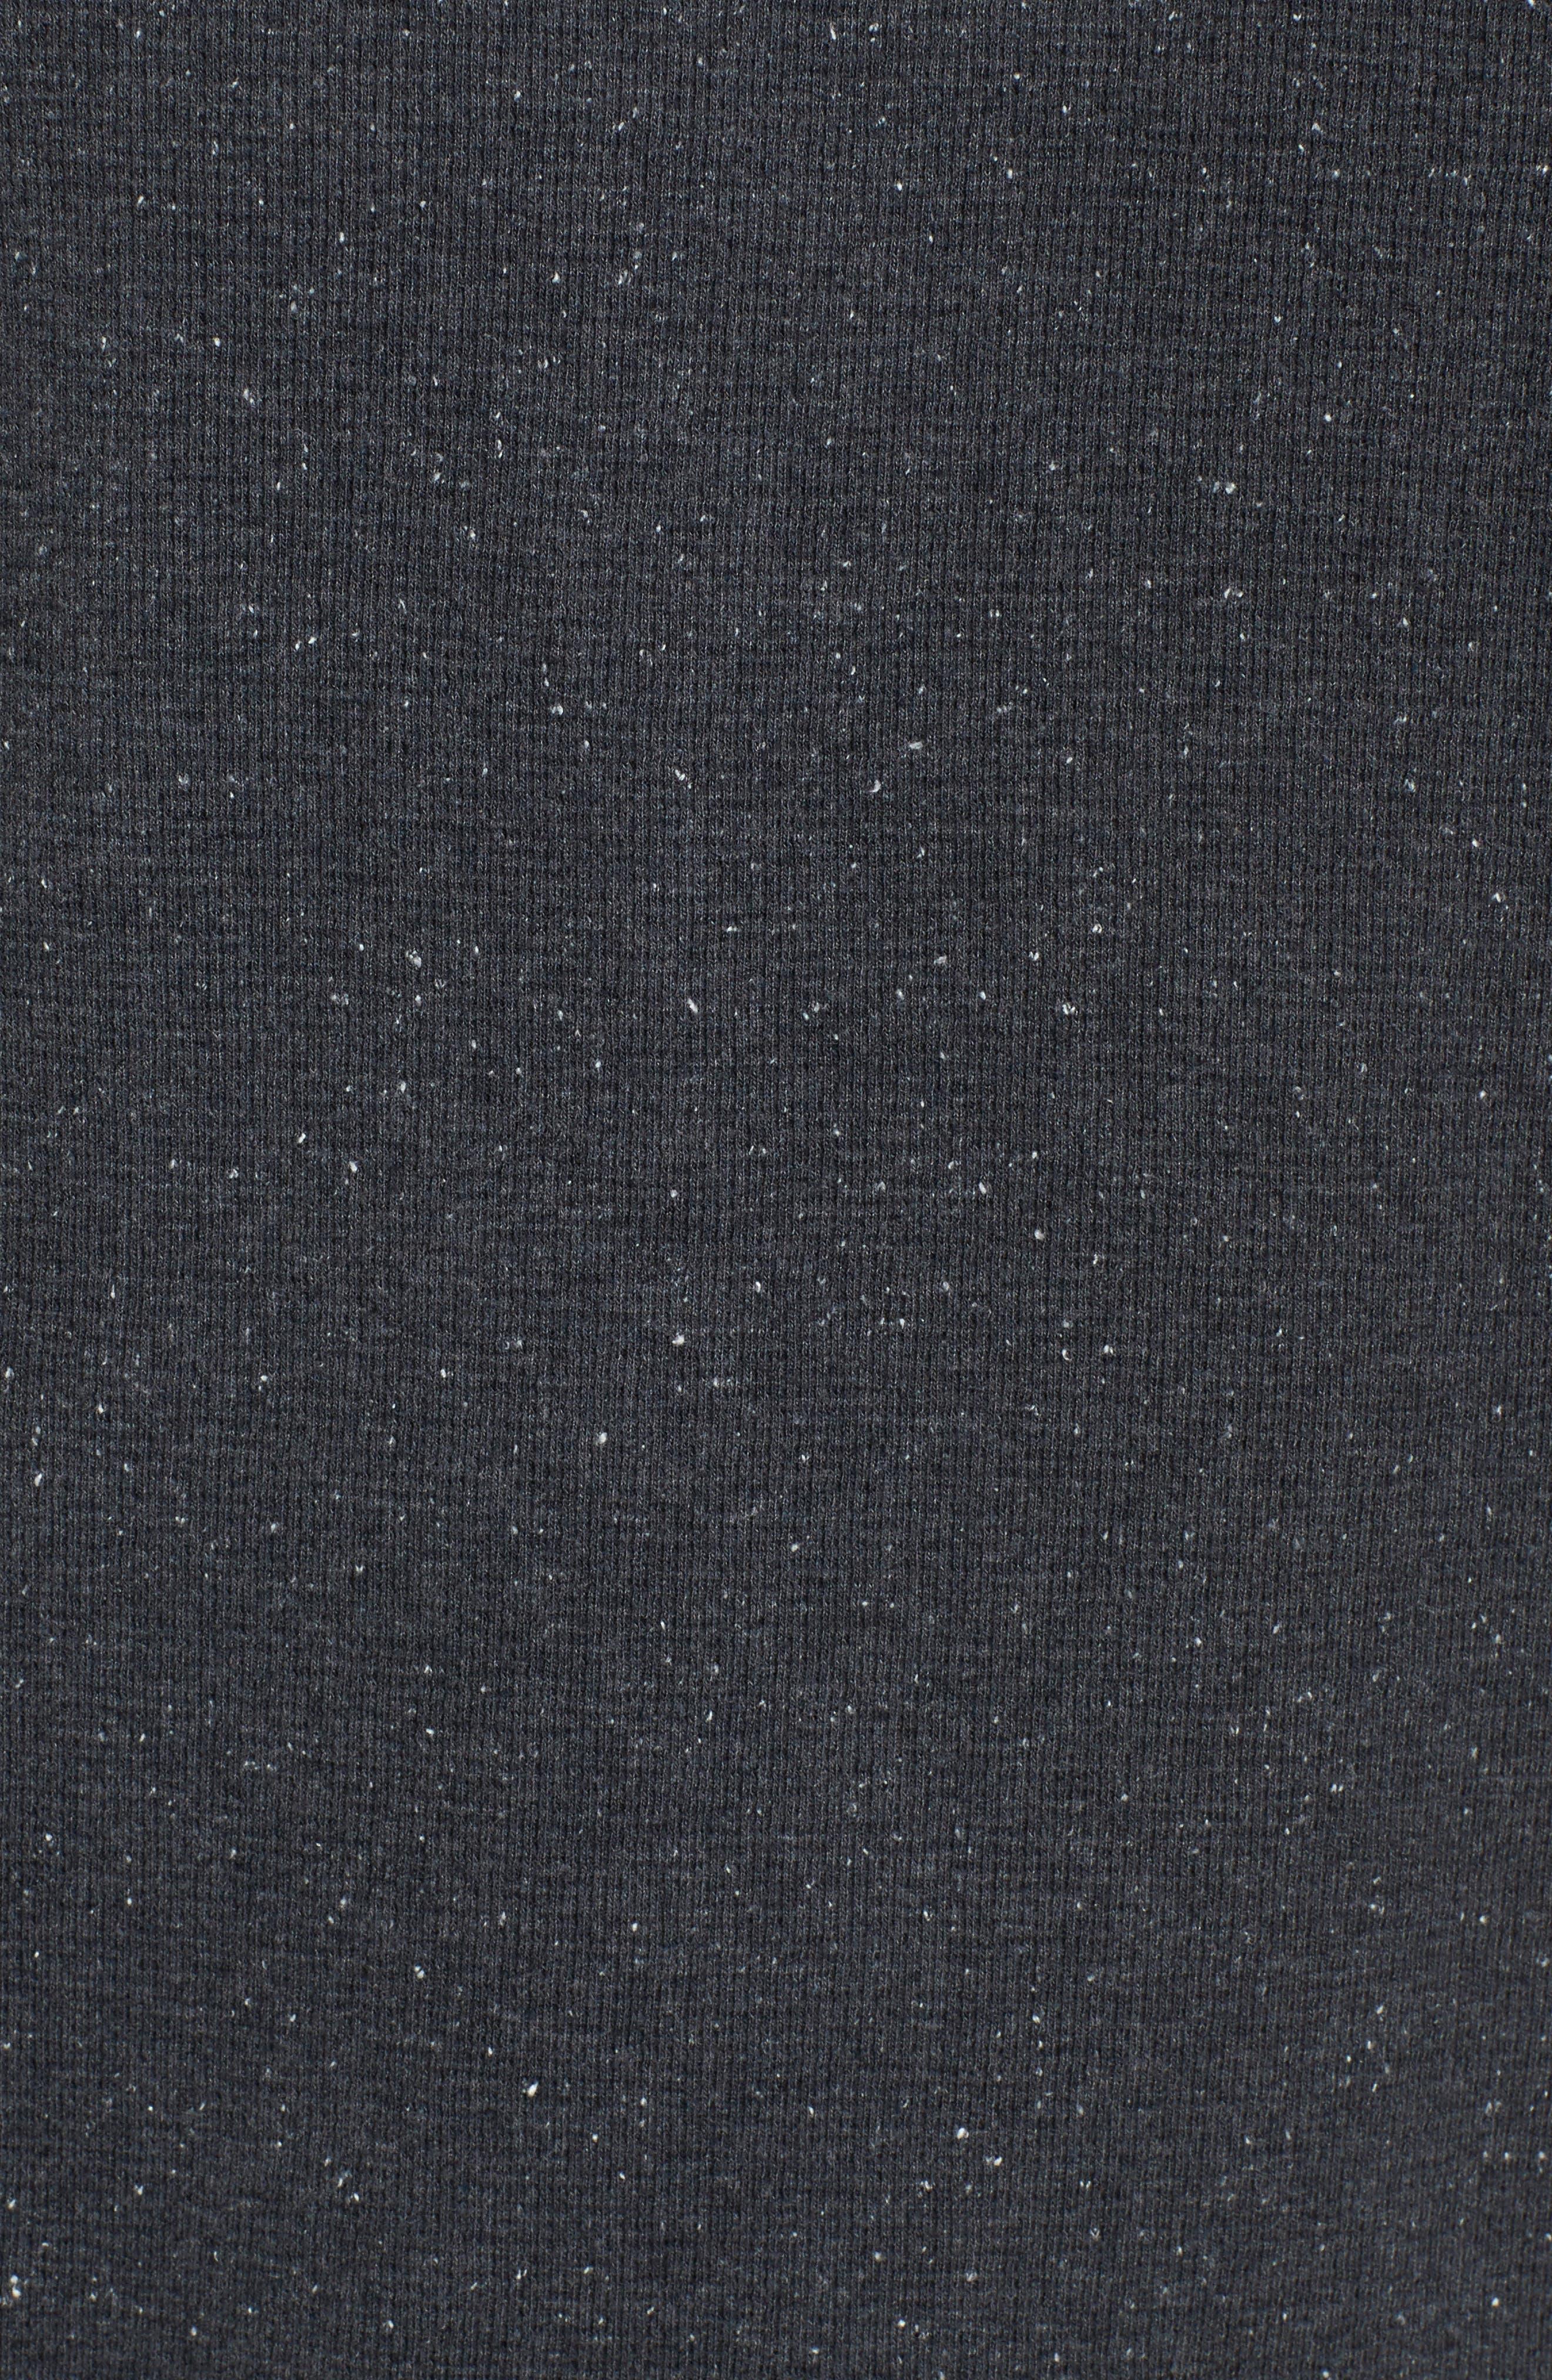 Burdett Thermal T-Shirt,                             Alternate thumbnail 5, color,                             001